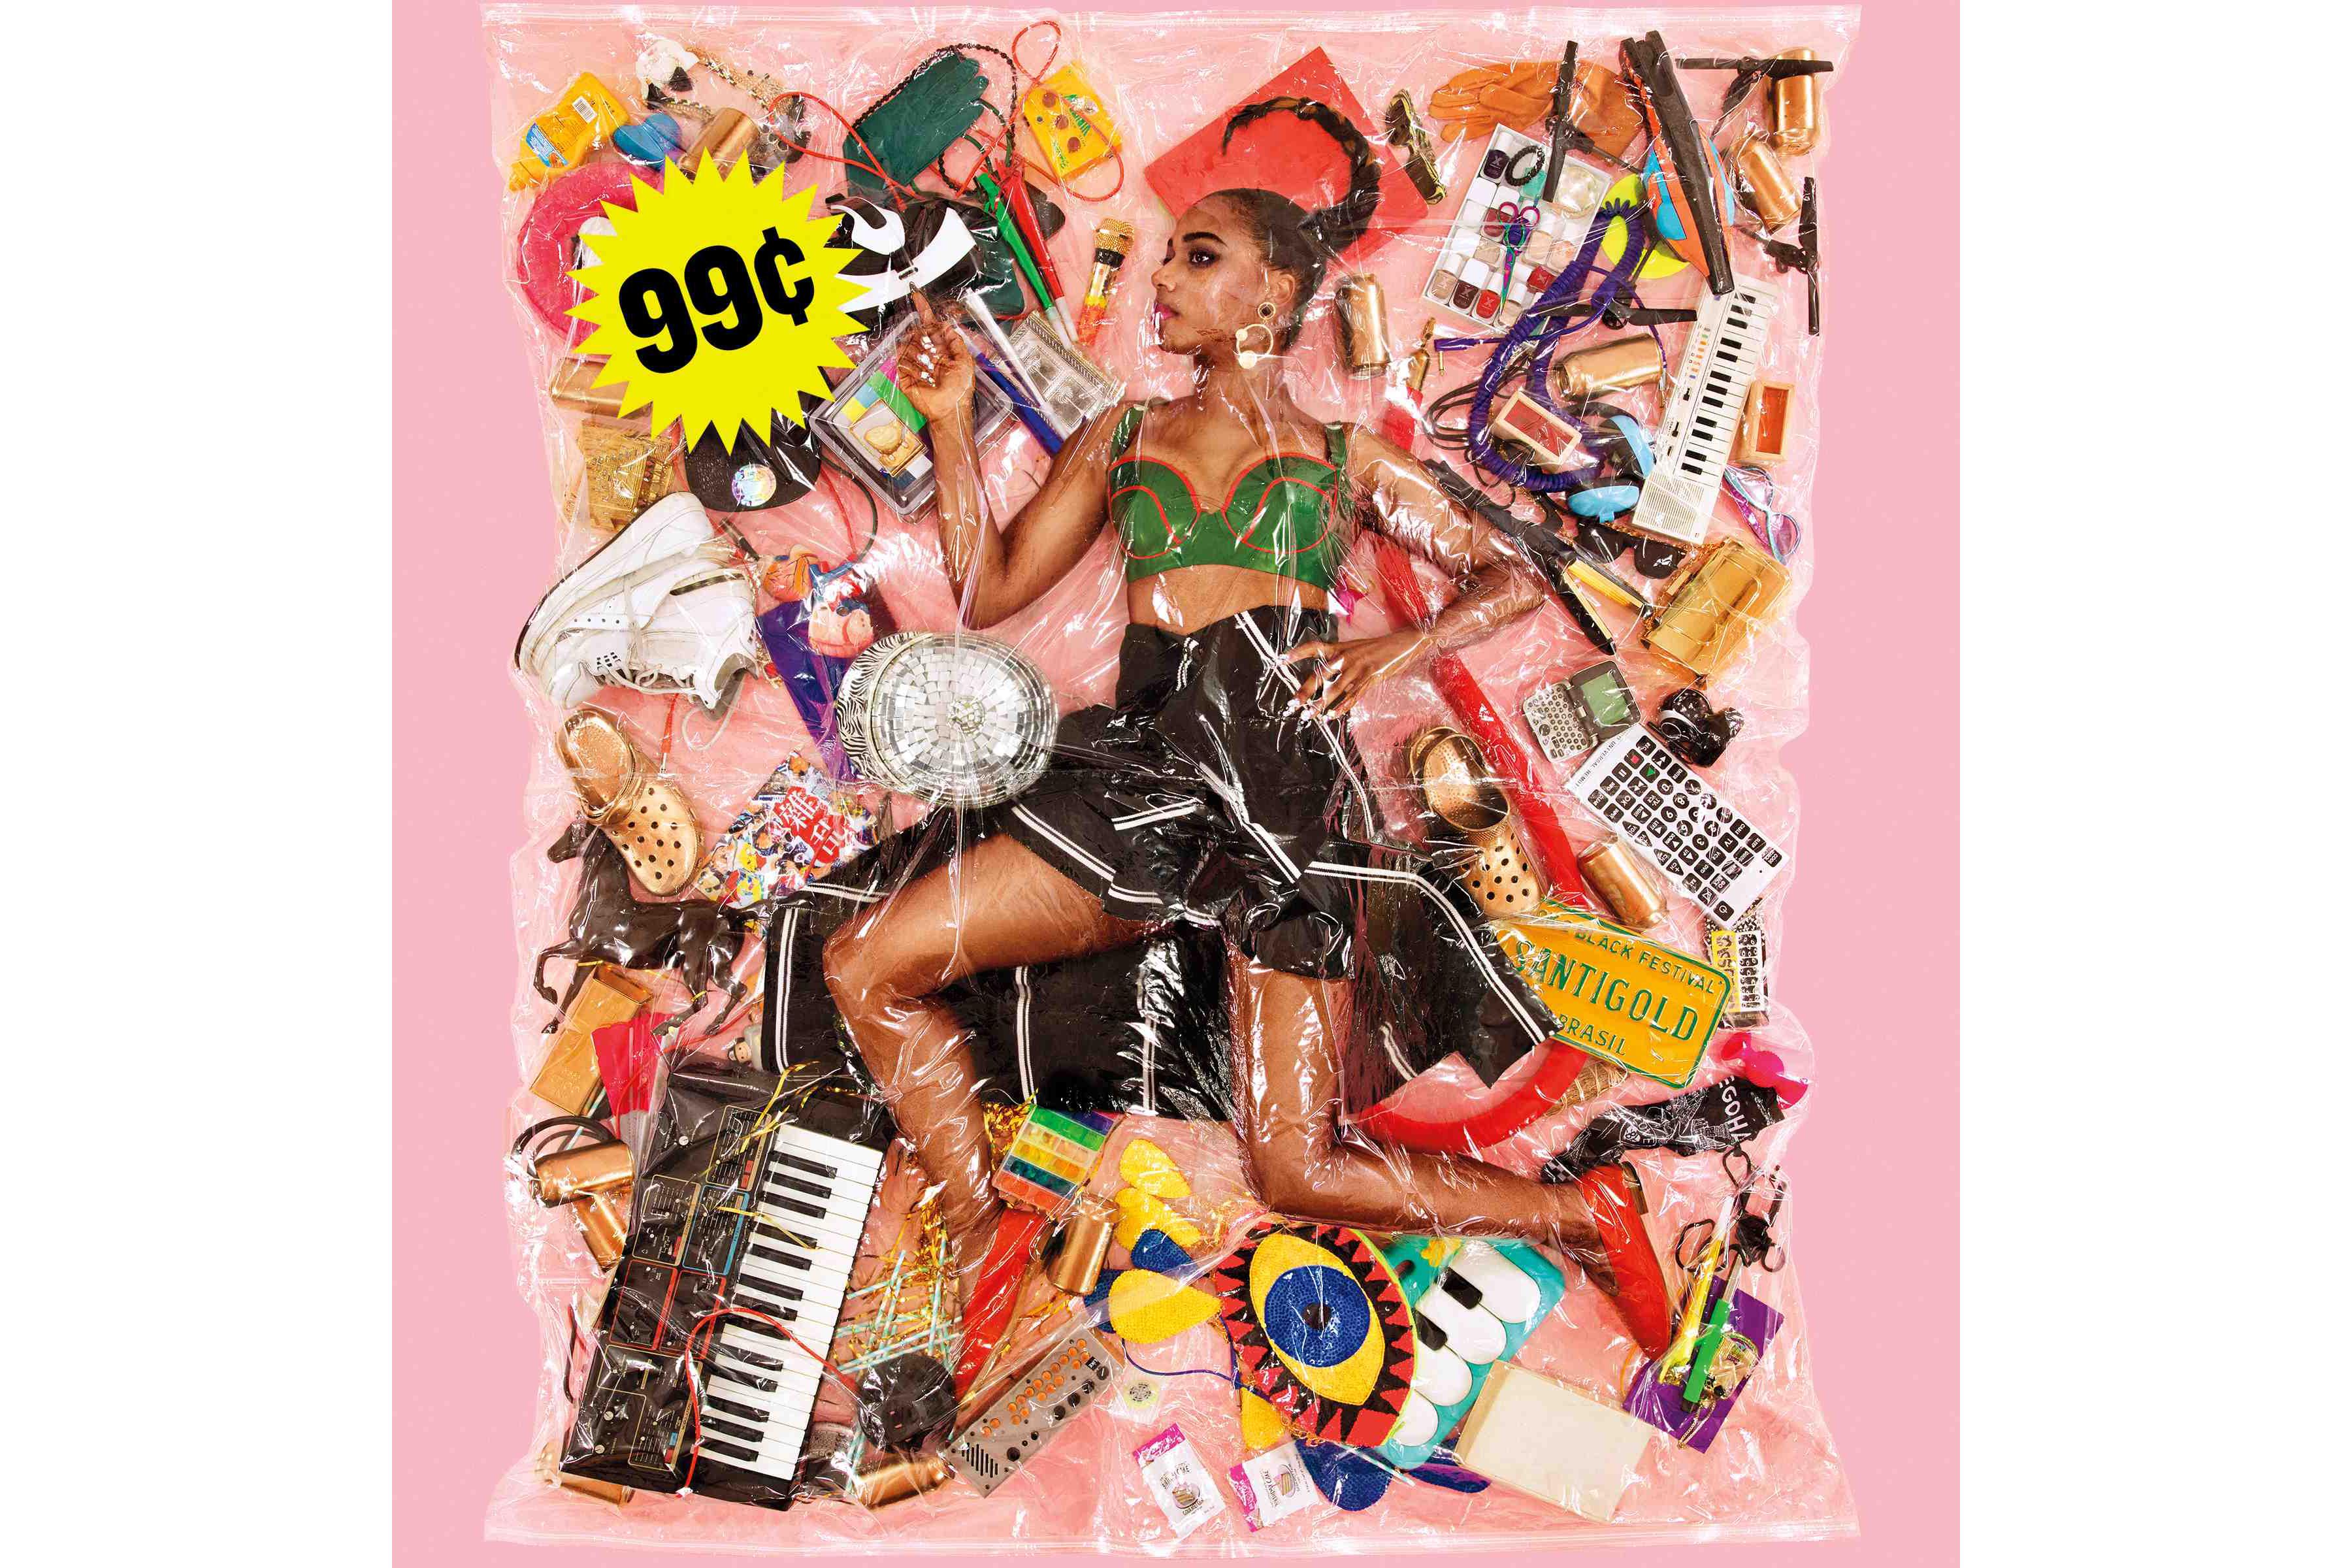 Stream Santigold's New Album '99¢'